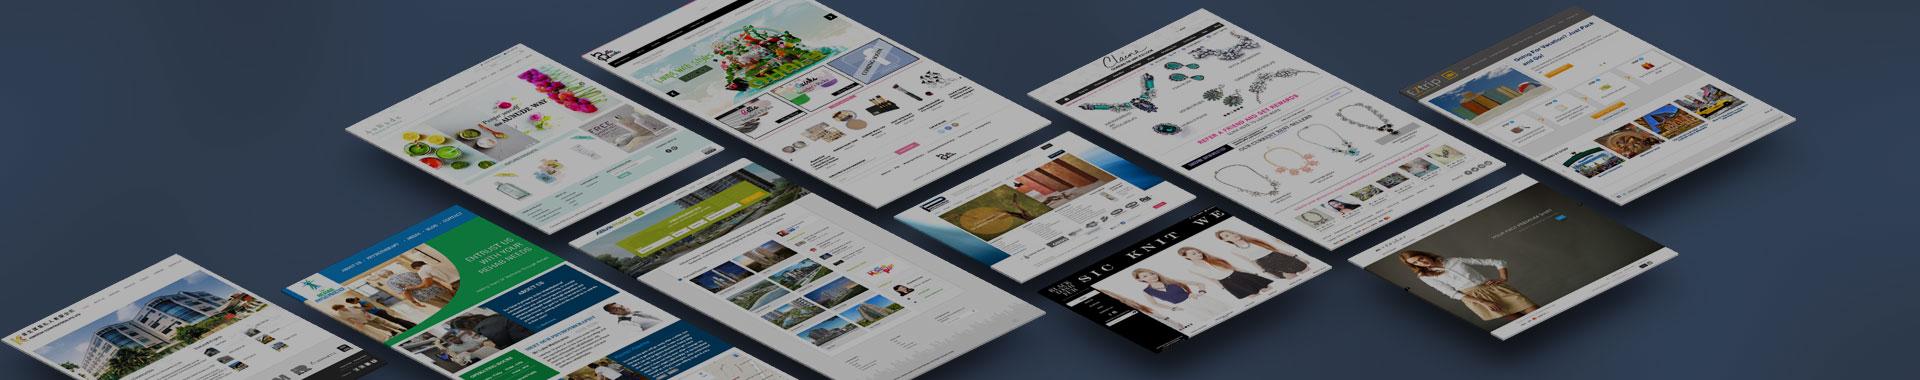 Website Design Singapore - Natron